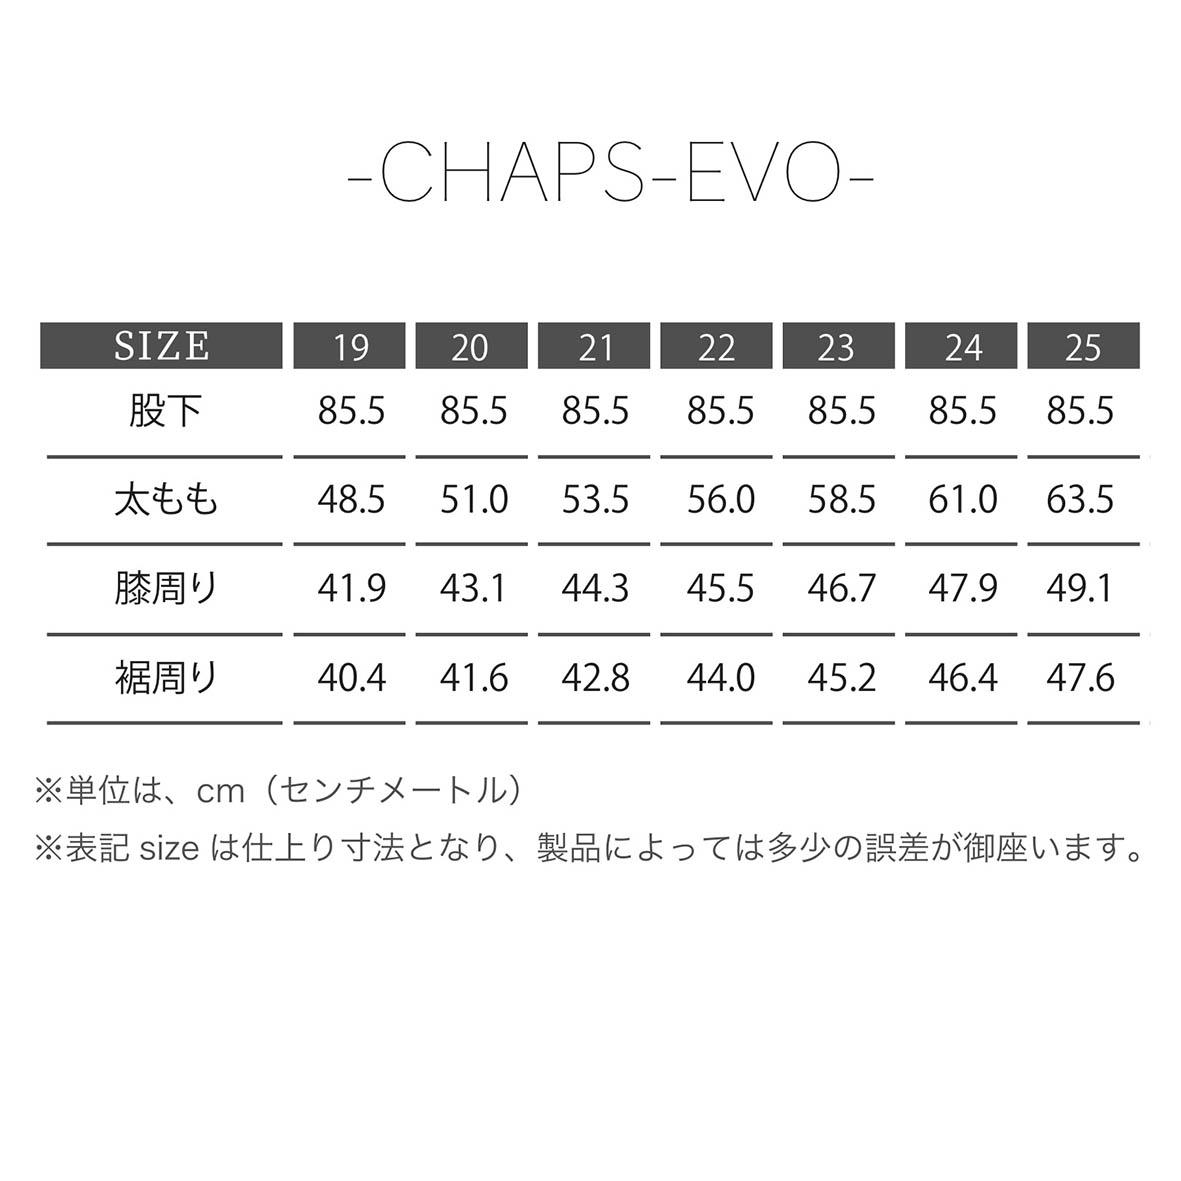 KADOYA(カドヤ) K'S LEATHER CHAPS-EVO2 チャップス-エボ2